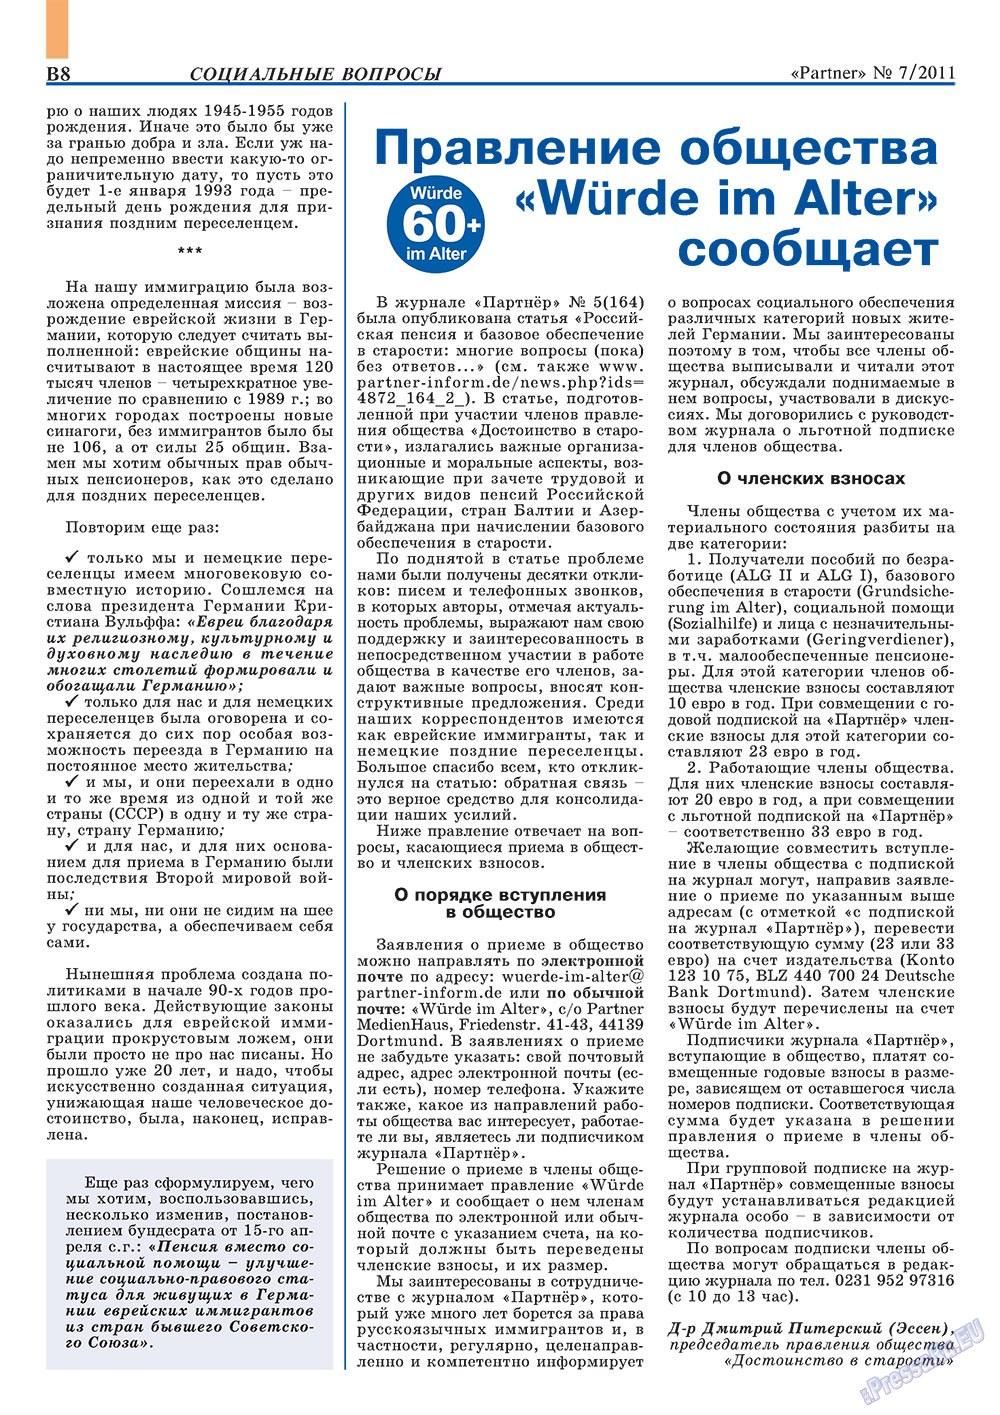 Партнер-север (журнал). 2011 год, номер 7, стр. 18